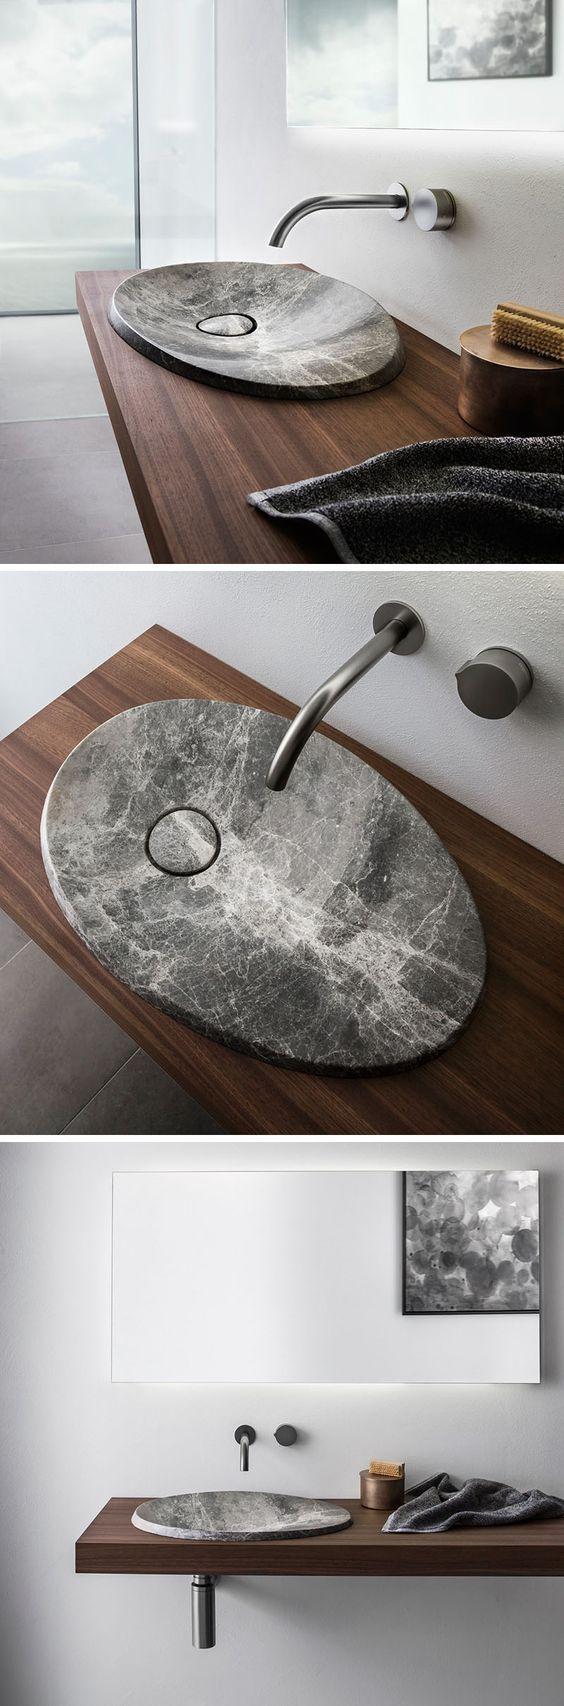 Top 20 Affordable Ferguson Bathroom Faucets Under $250